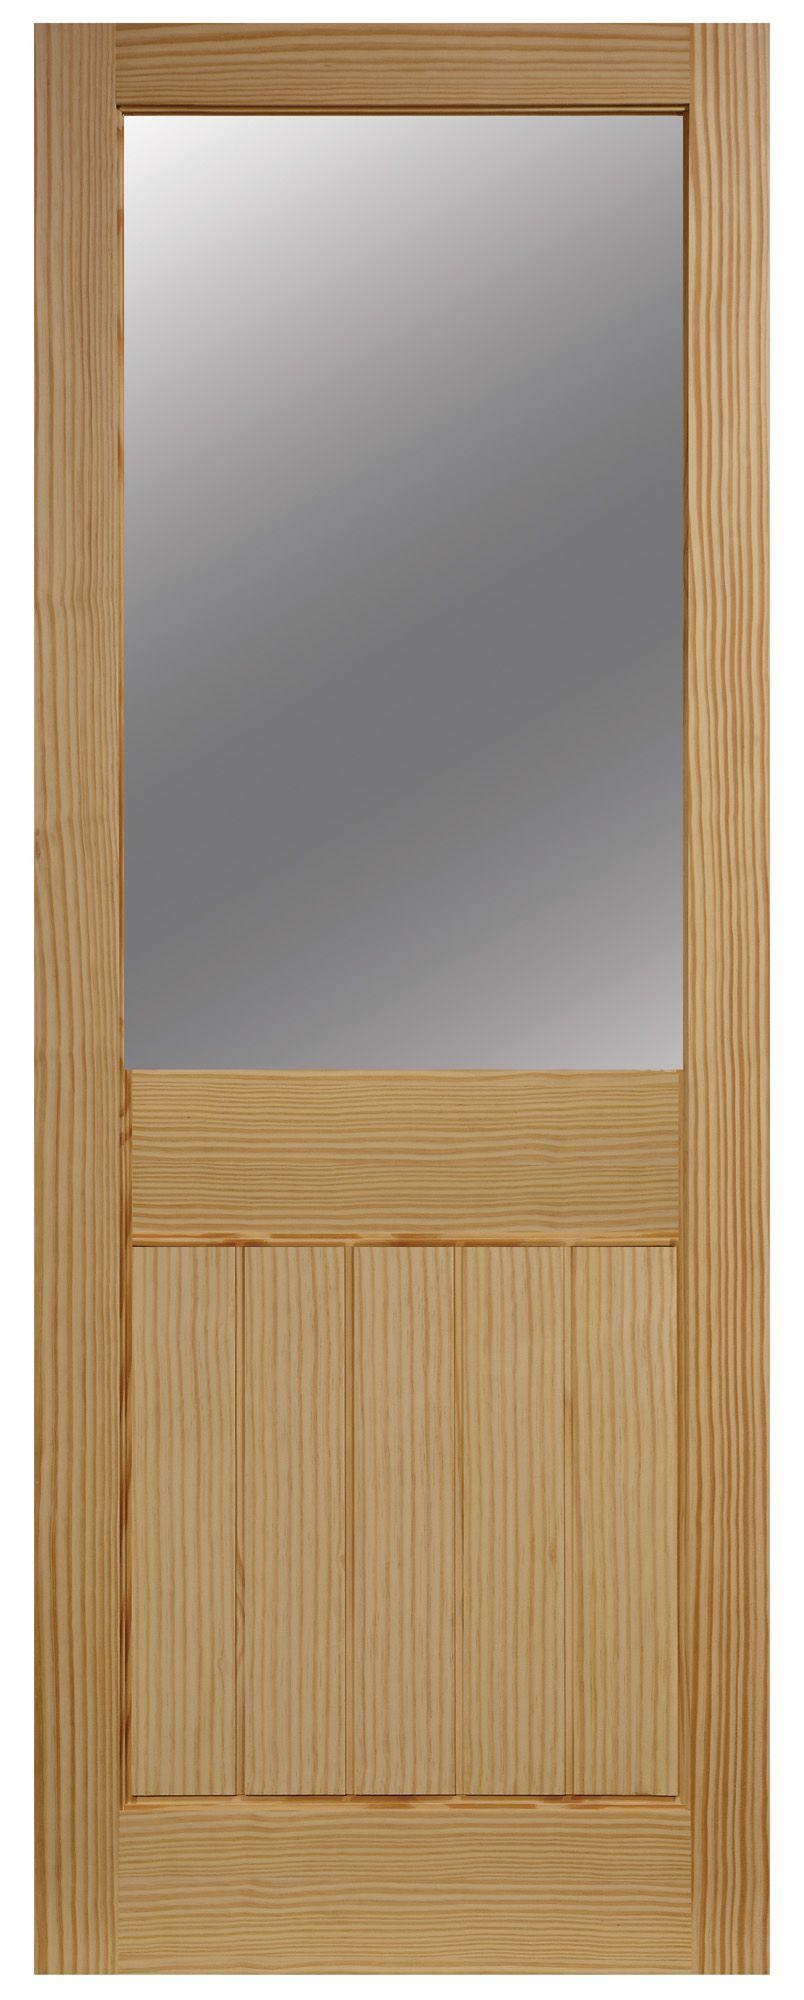 Cottage 2 Panel Clear Pine Glazed Internal Standard Door, (h)1981mm (w)838mm